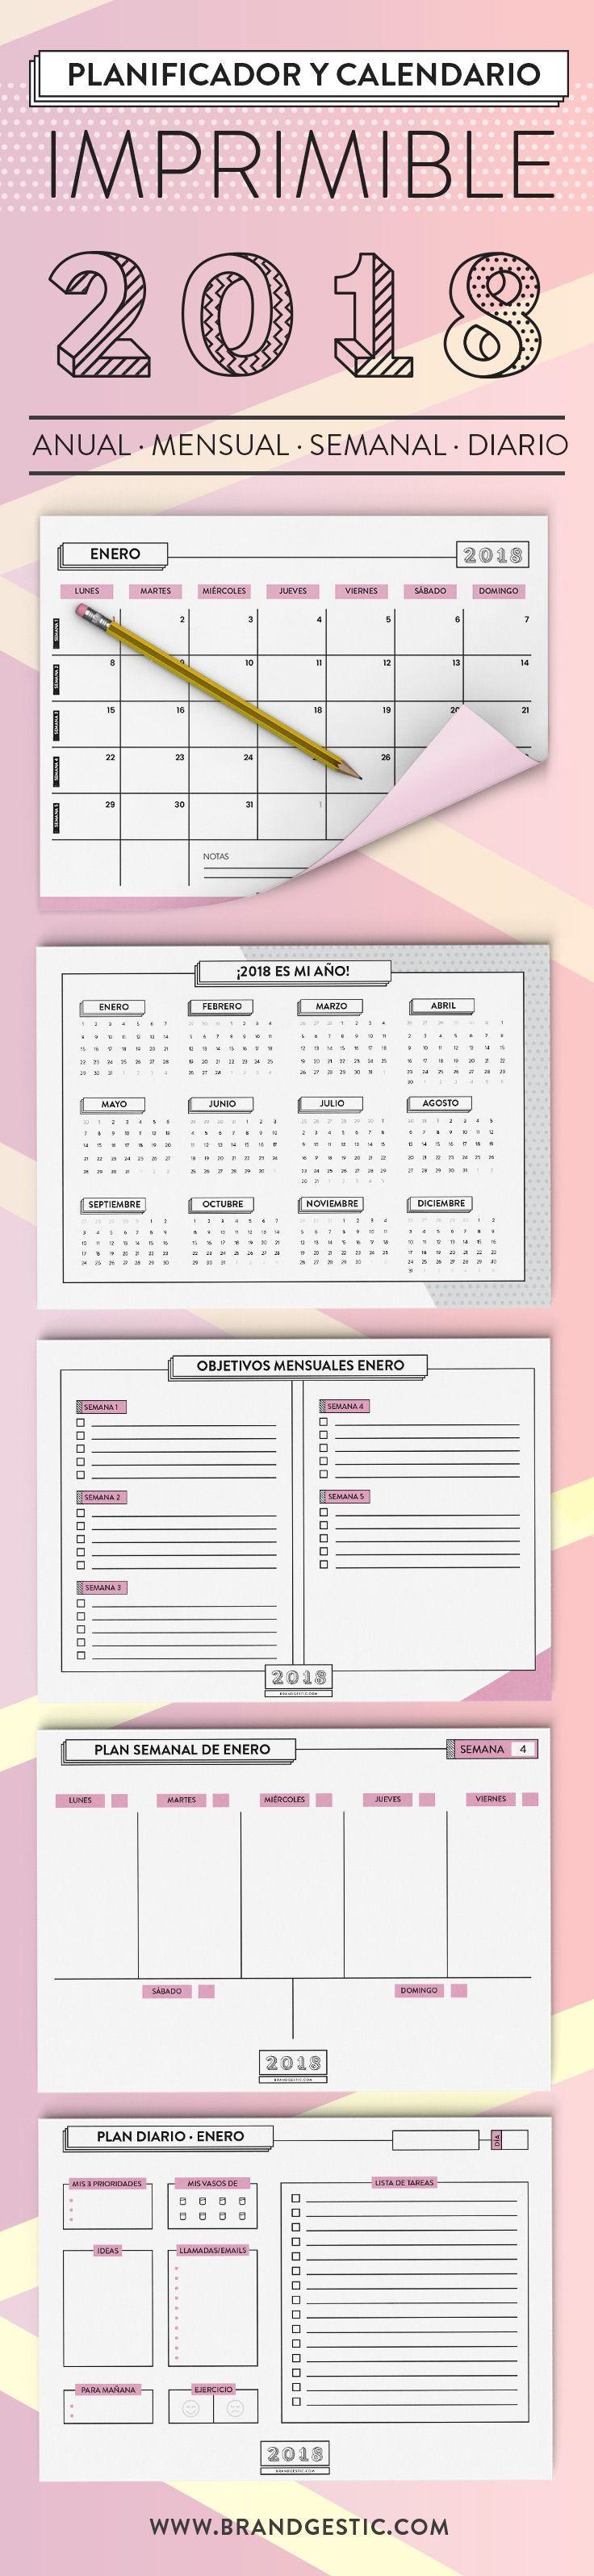 Calendario Planificador Imprimible